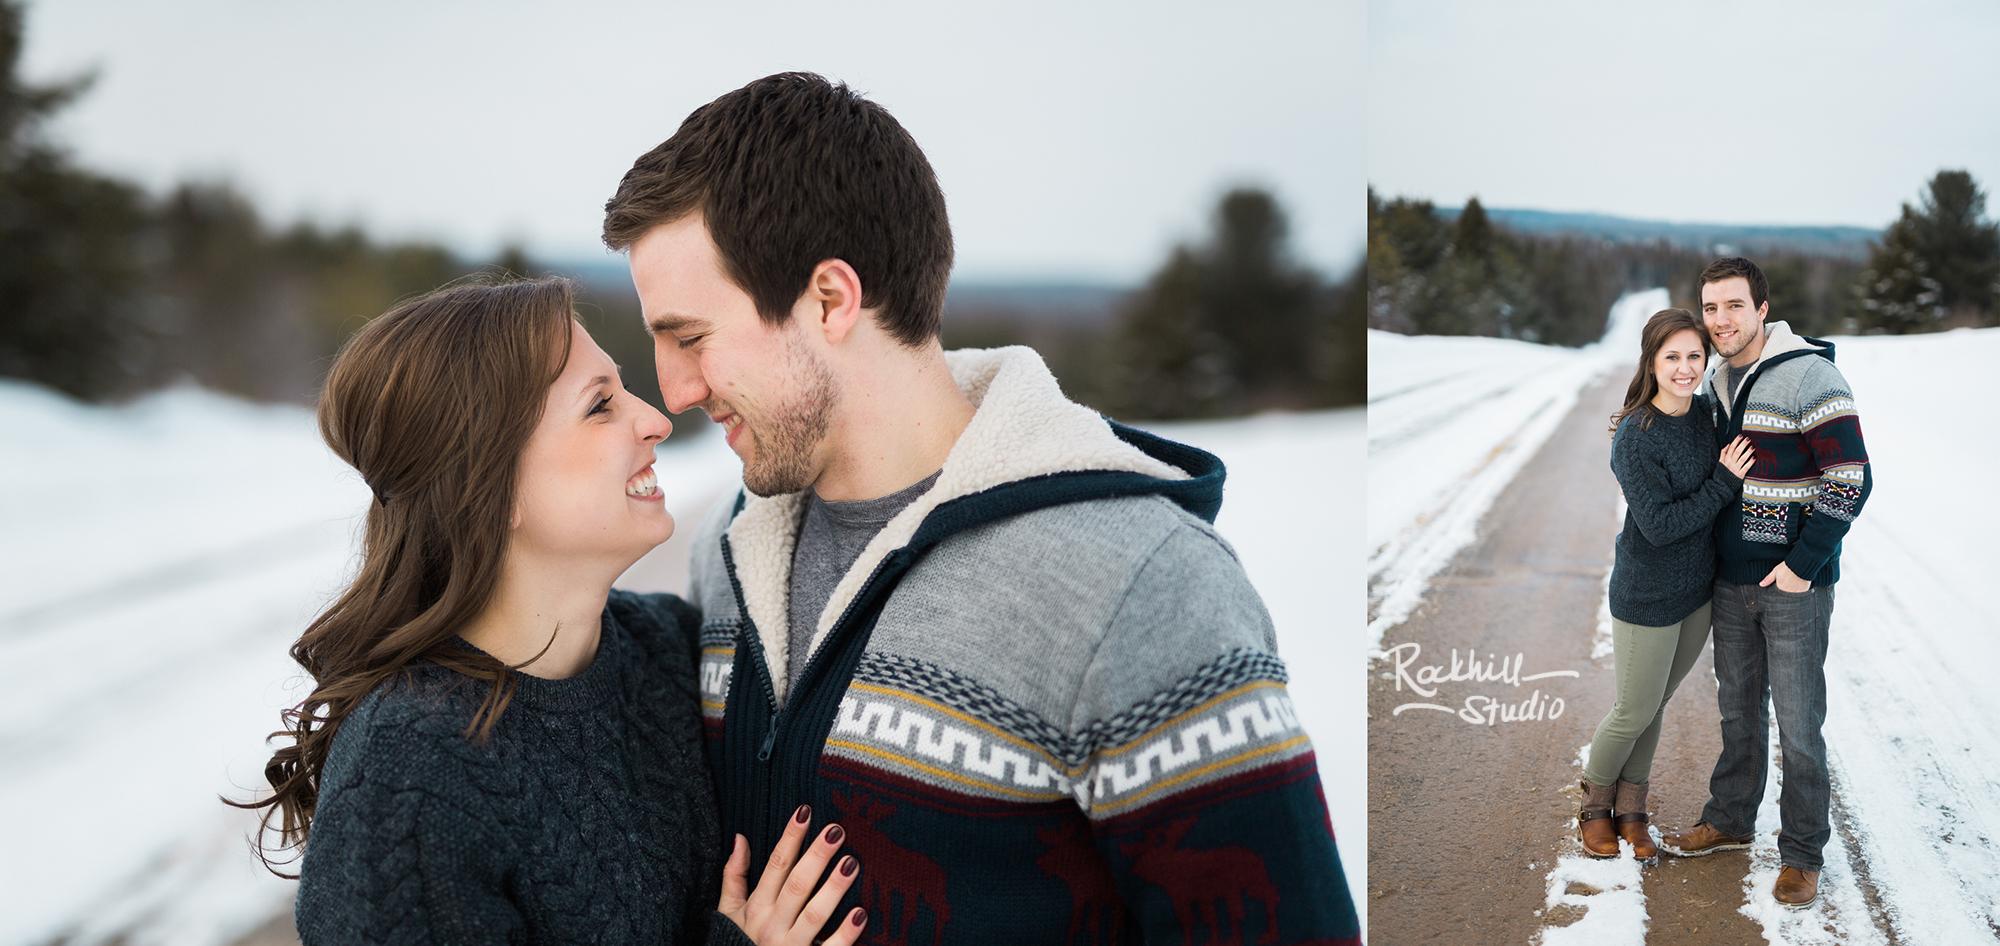 northern-michigan-upper-peninsula-engagement-photography-wedding-rockhill-studio-traverse-city-19.jpg